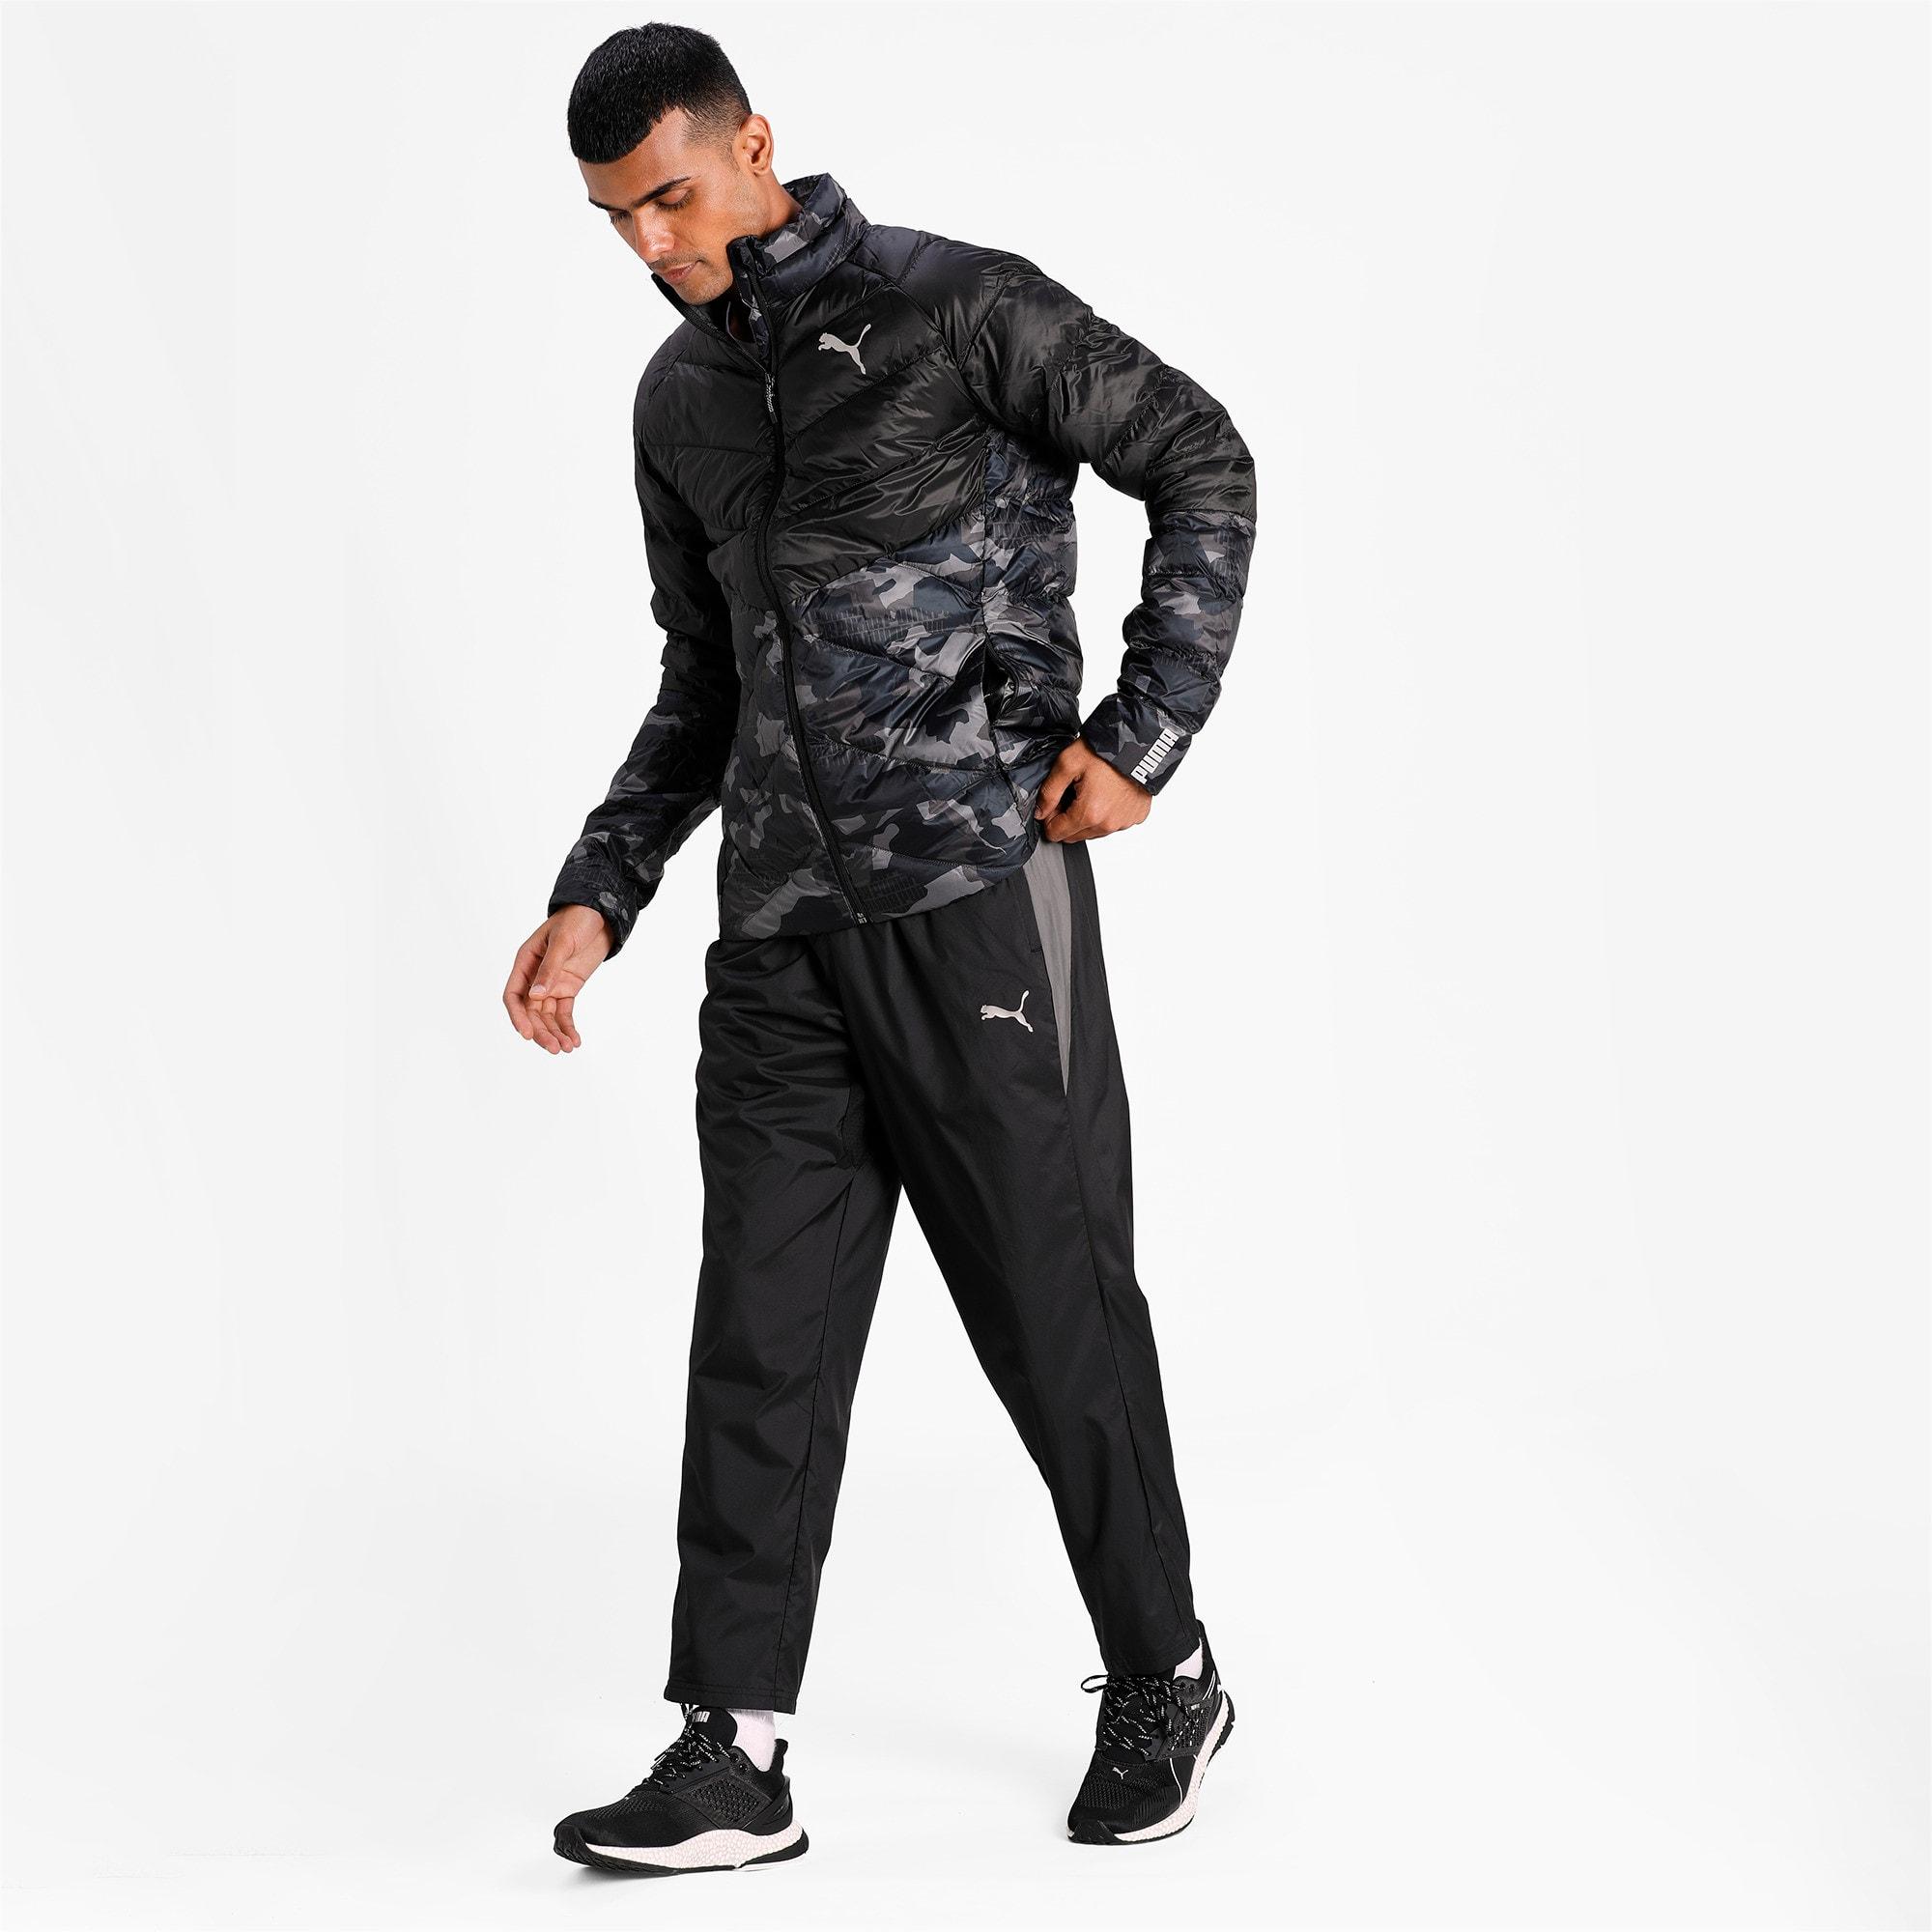 Thumbnail 3 of Reactive Woven Men's Training Pants, Puma Black-CASTLEROCK, medium-IND